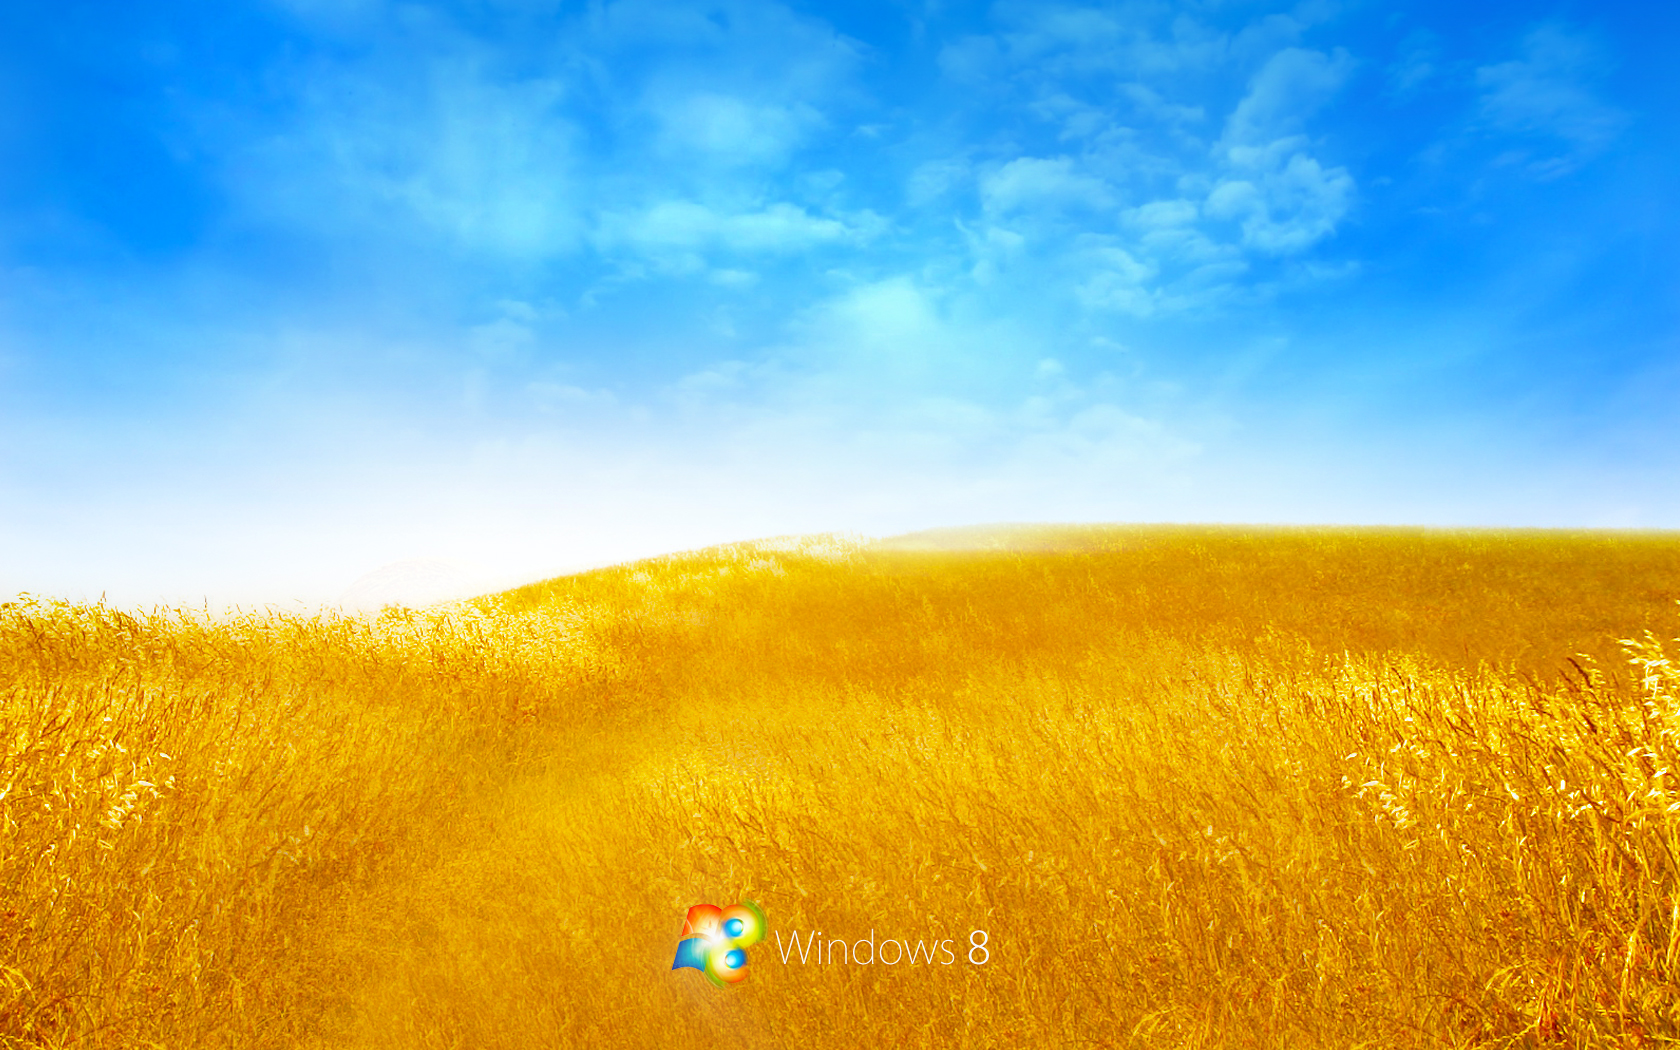 1680x1050 Windows 8 Bliss desktop PC and Mac wallpaper 1680x1050